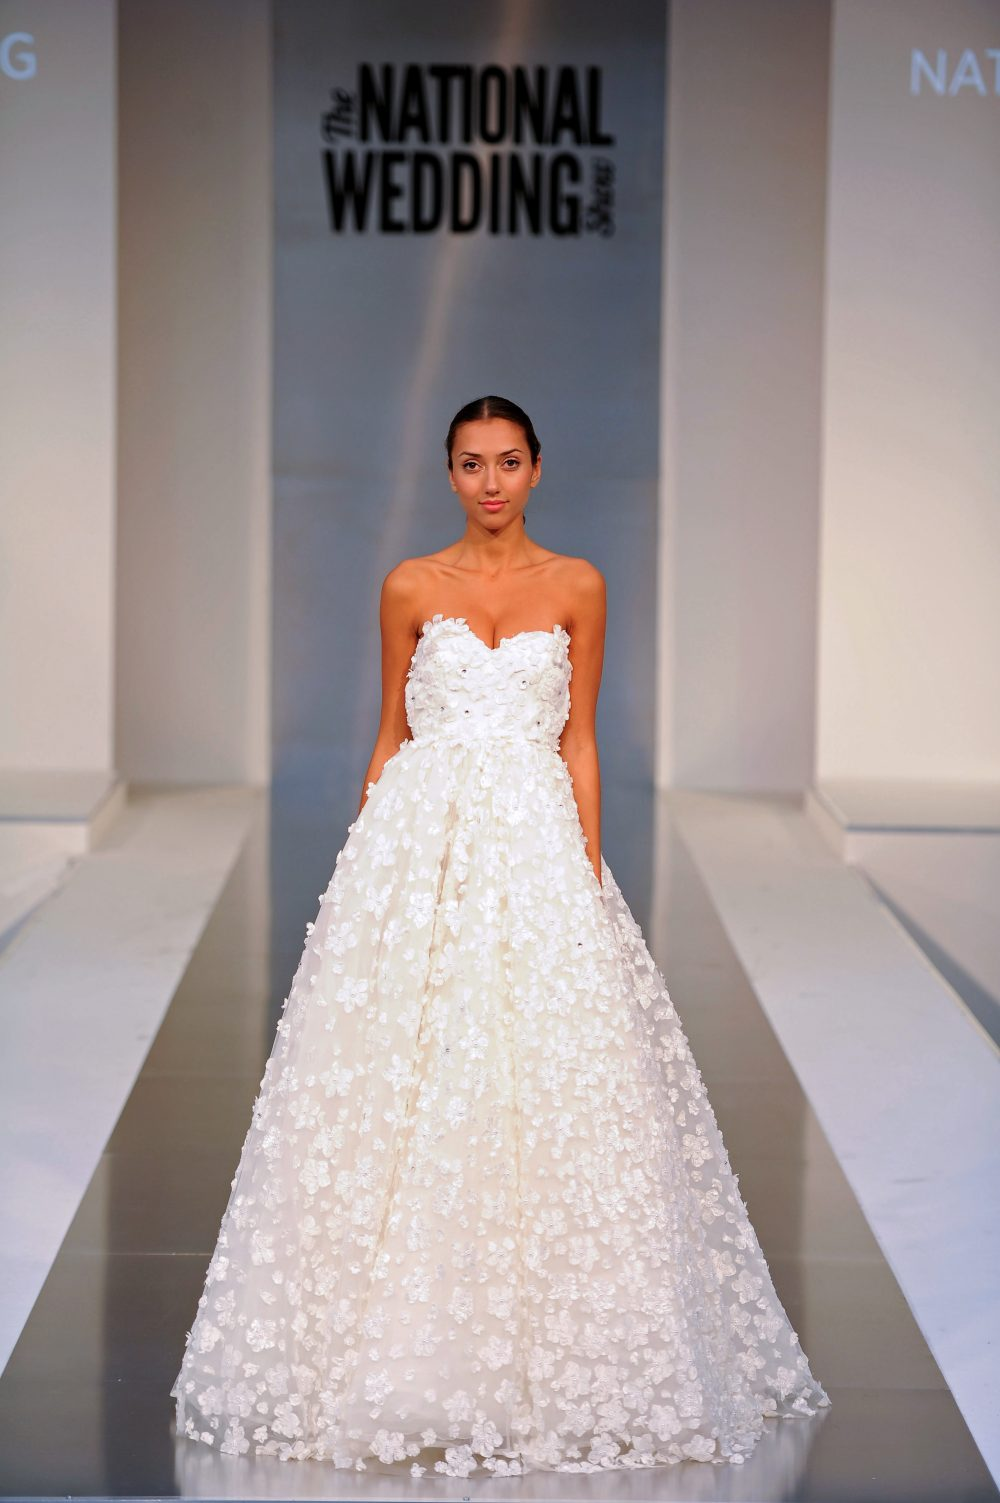 Win Wedding Dress 79 Cute The National Wedding Show